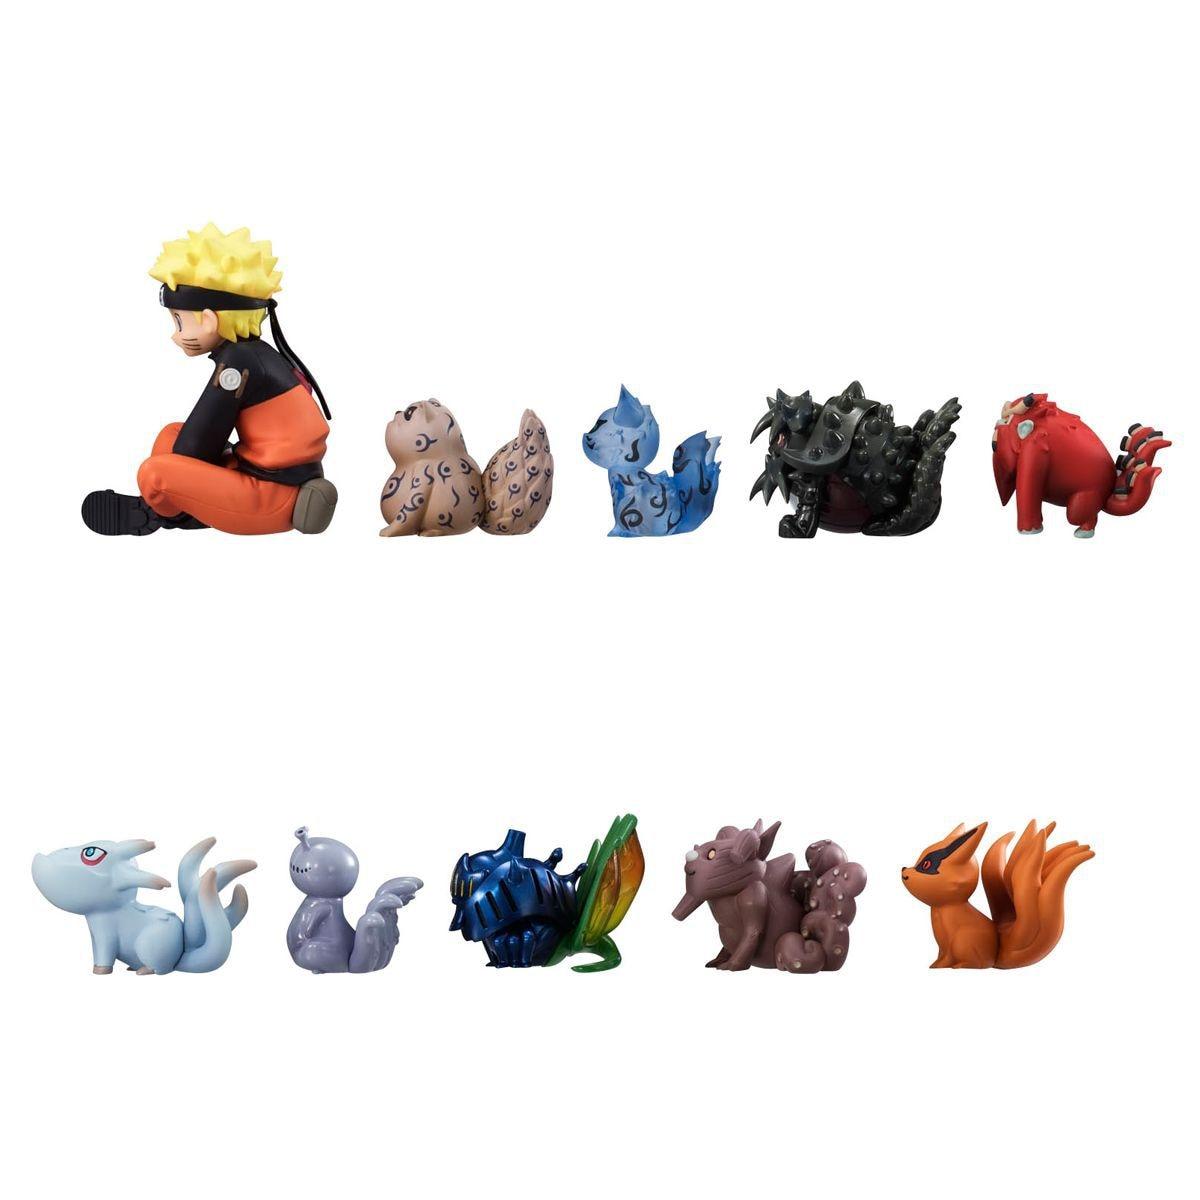 10pcs/set  Anime Naruto Sasuke with Pet Animal Collection Action Figure Toys 6cm